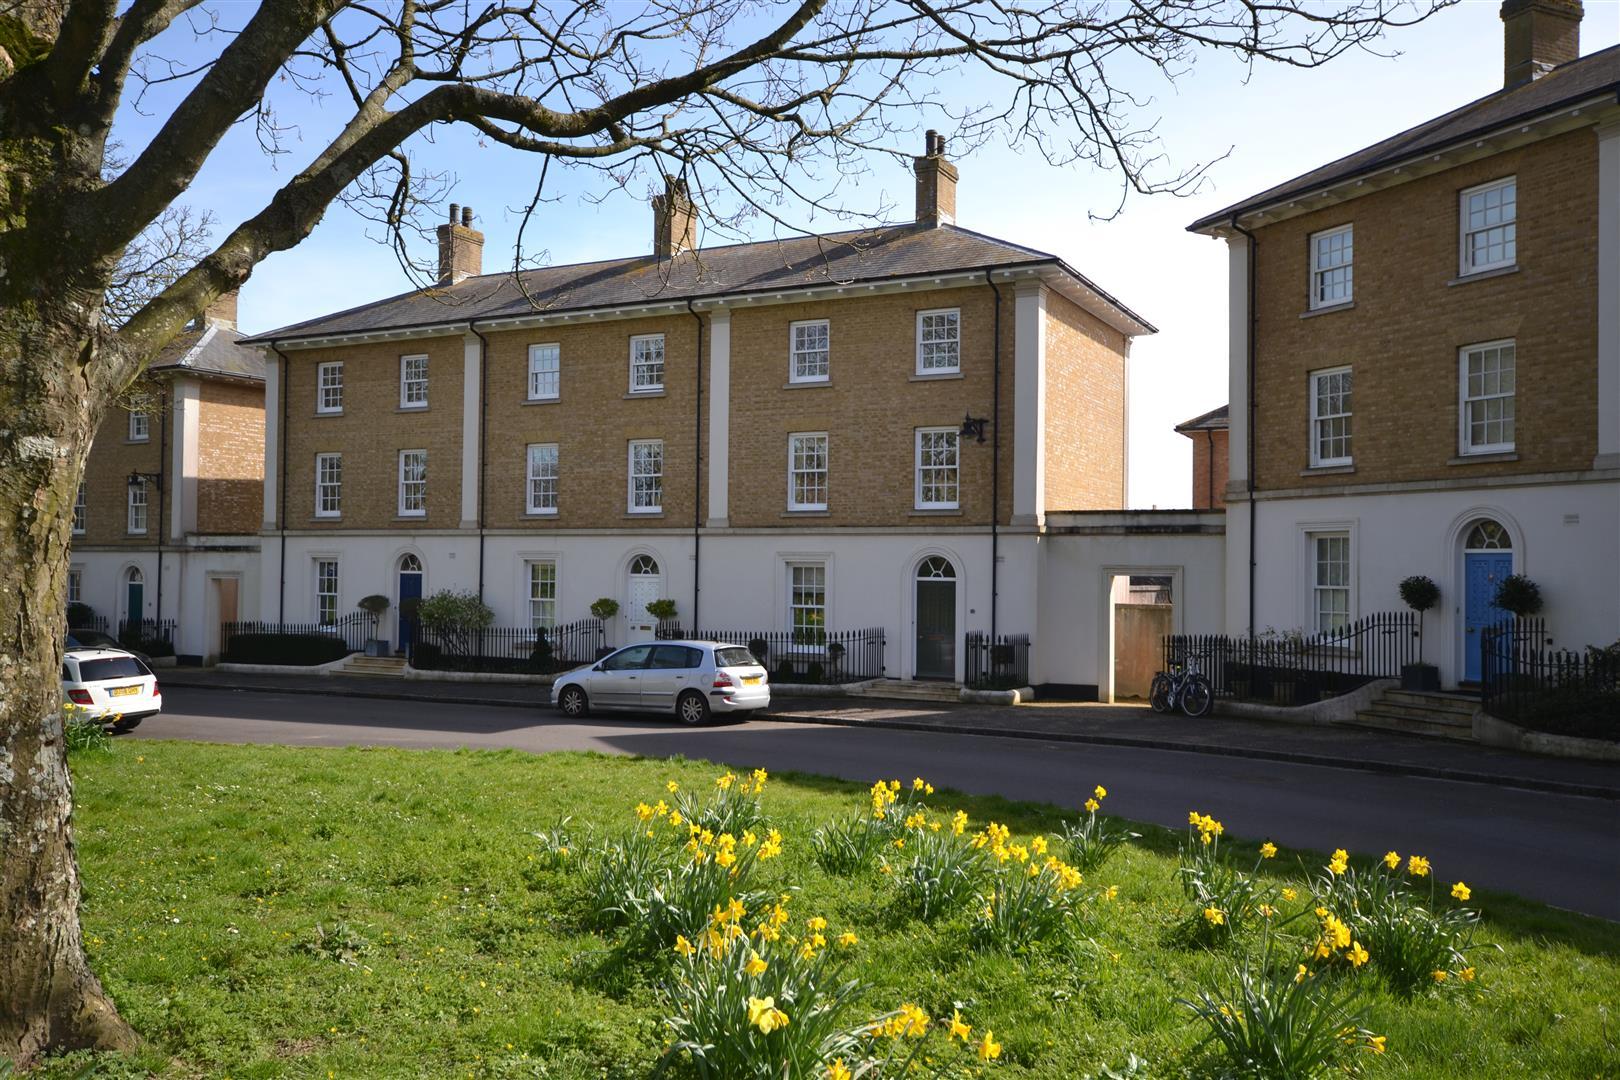 Woodlands Crescent, Poundbury